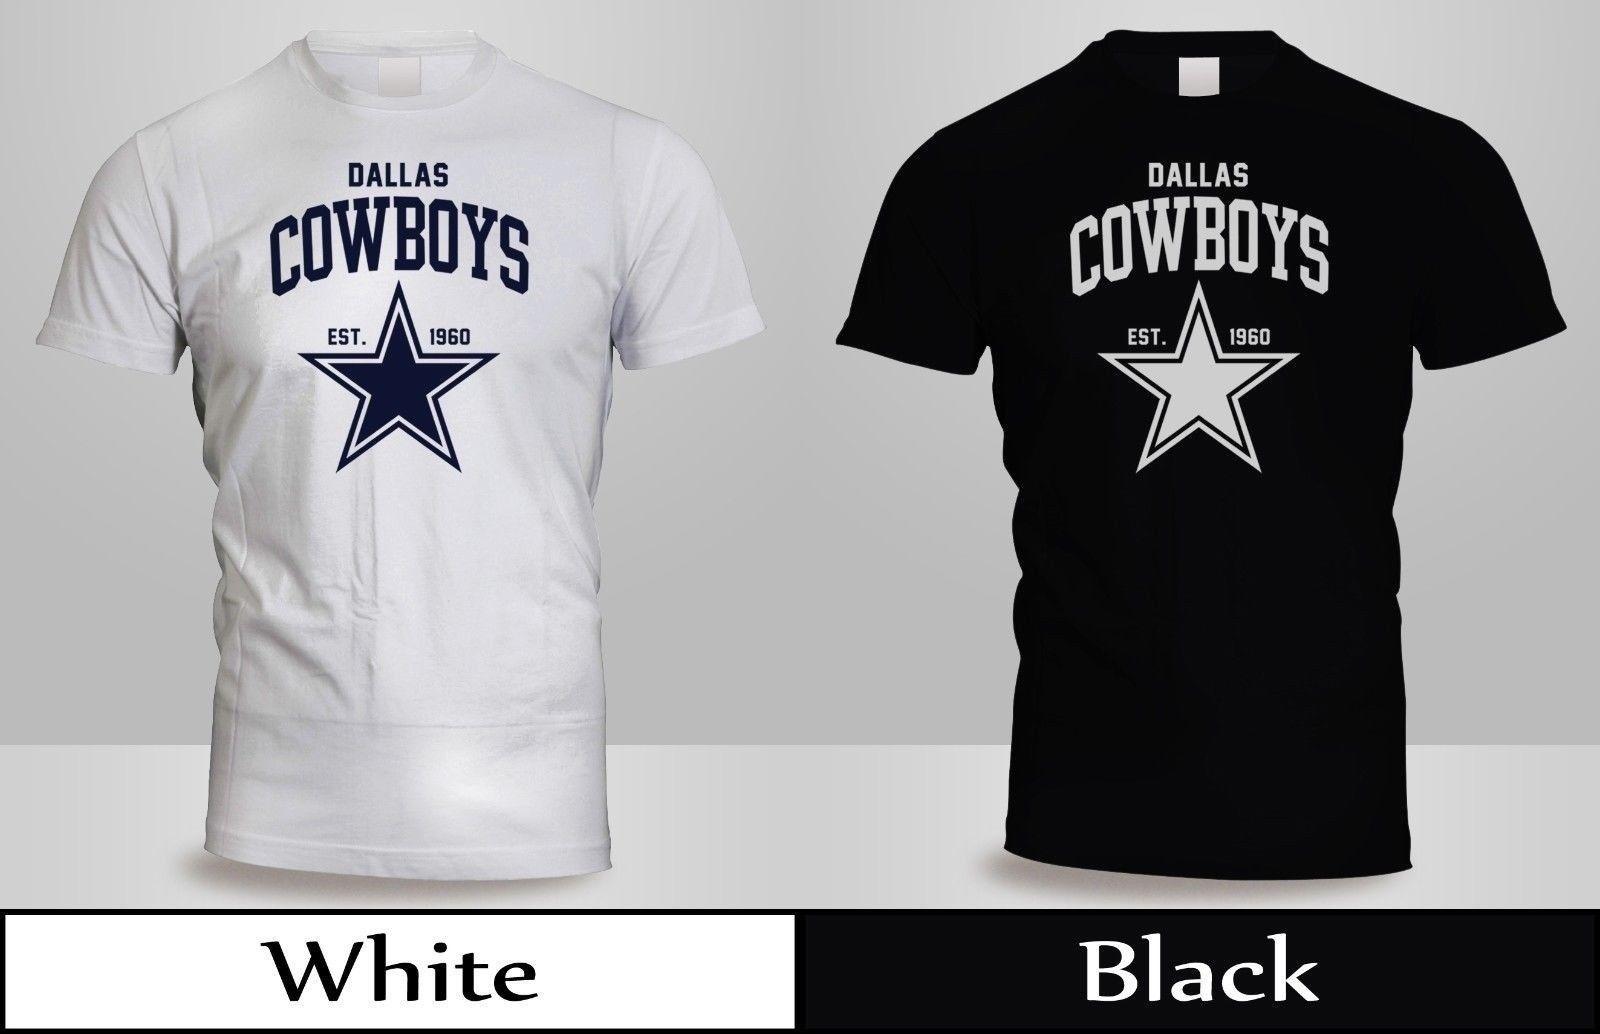 ab8a937f8 New DALLAS COWBOYS JERSEY T SHIRT Mens Black White SHirt 3 Humorous Shirts  Buy Tee Shirts From Lm32tshirt